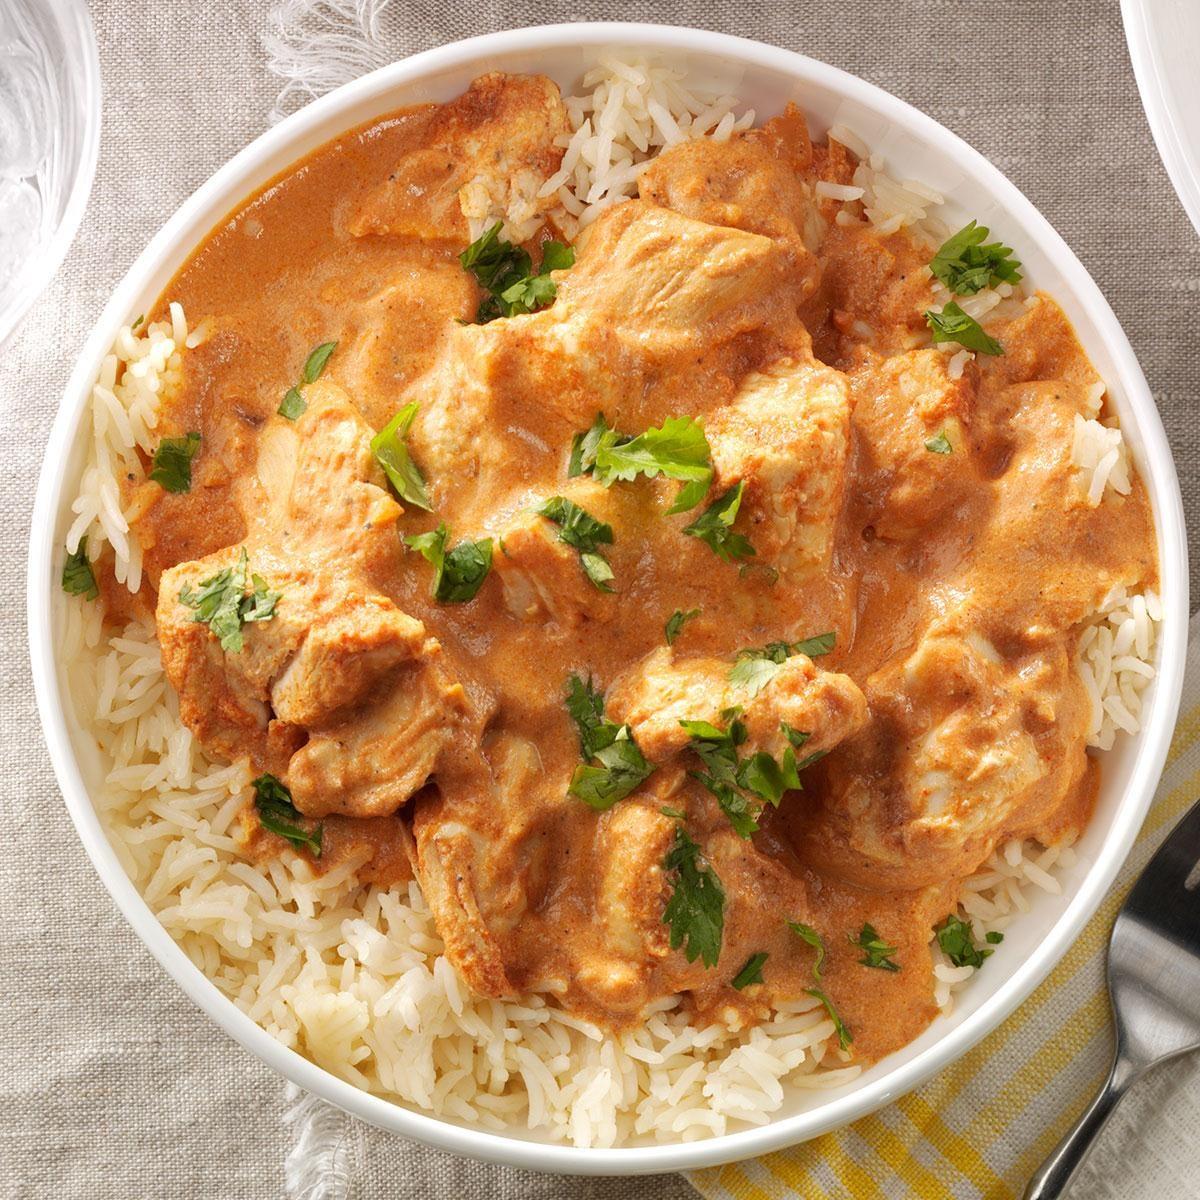 Watch Chicken Tikka Masala Slow Cooker Recipe video